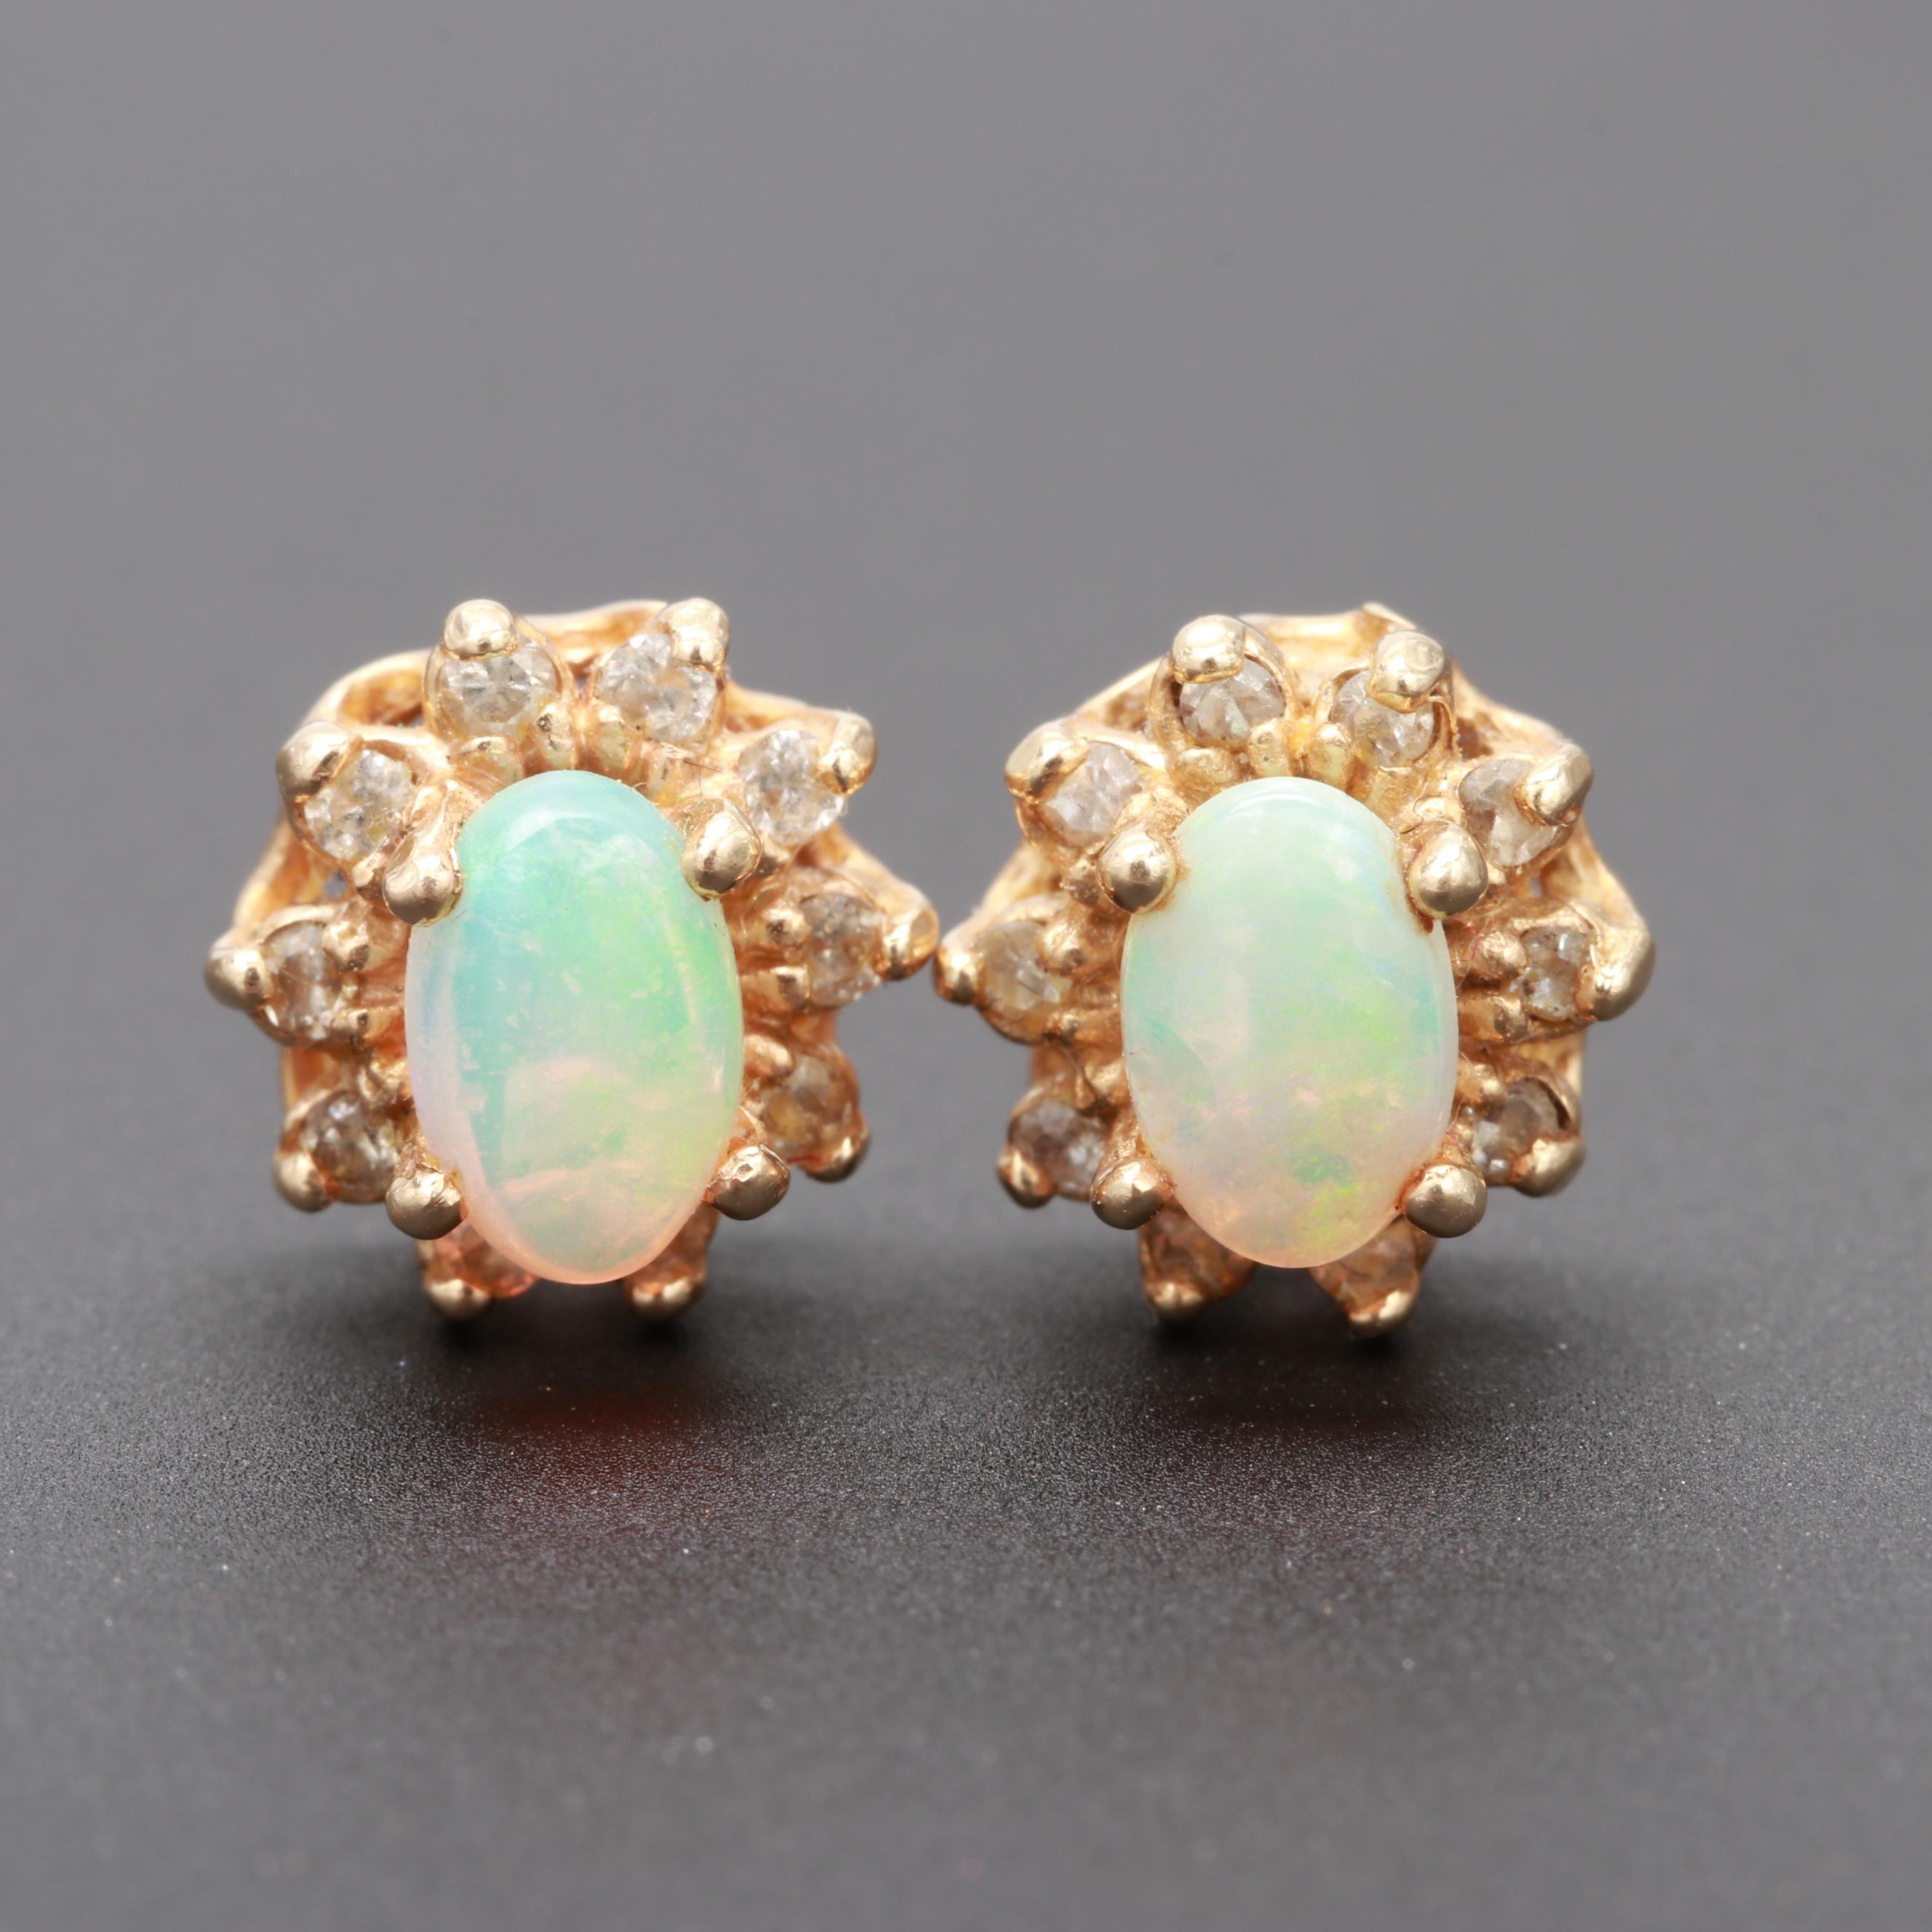 14K Yellow Gold Opal and Diamond Earrings